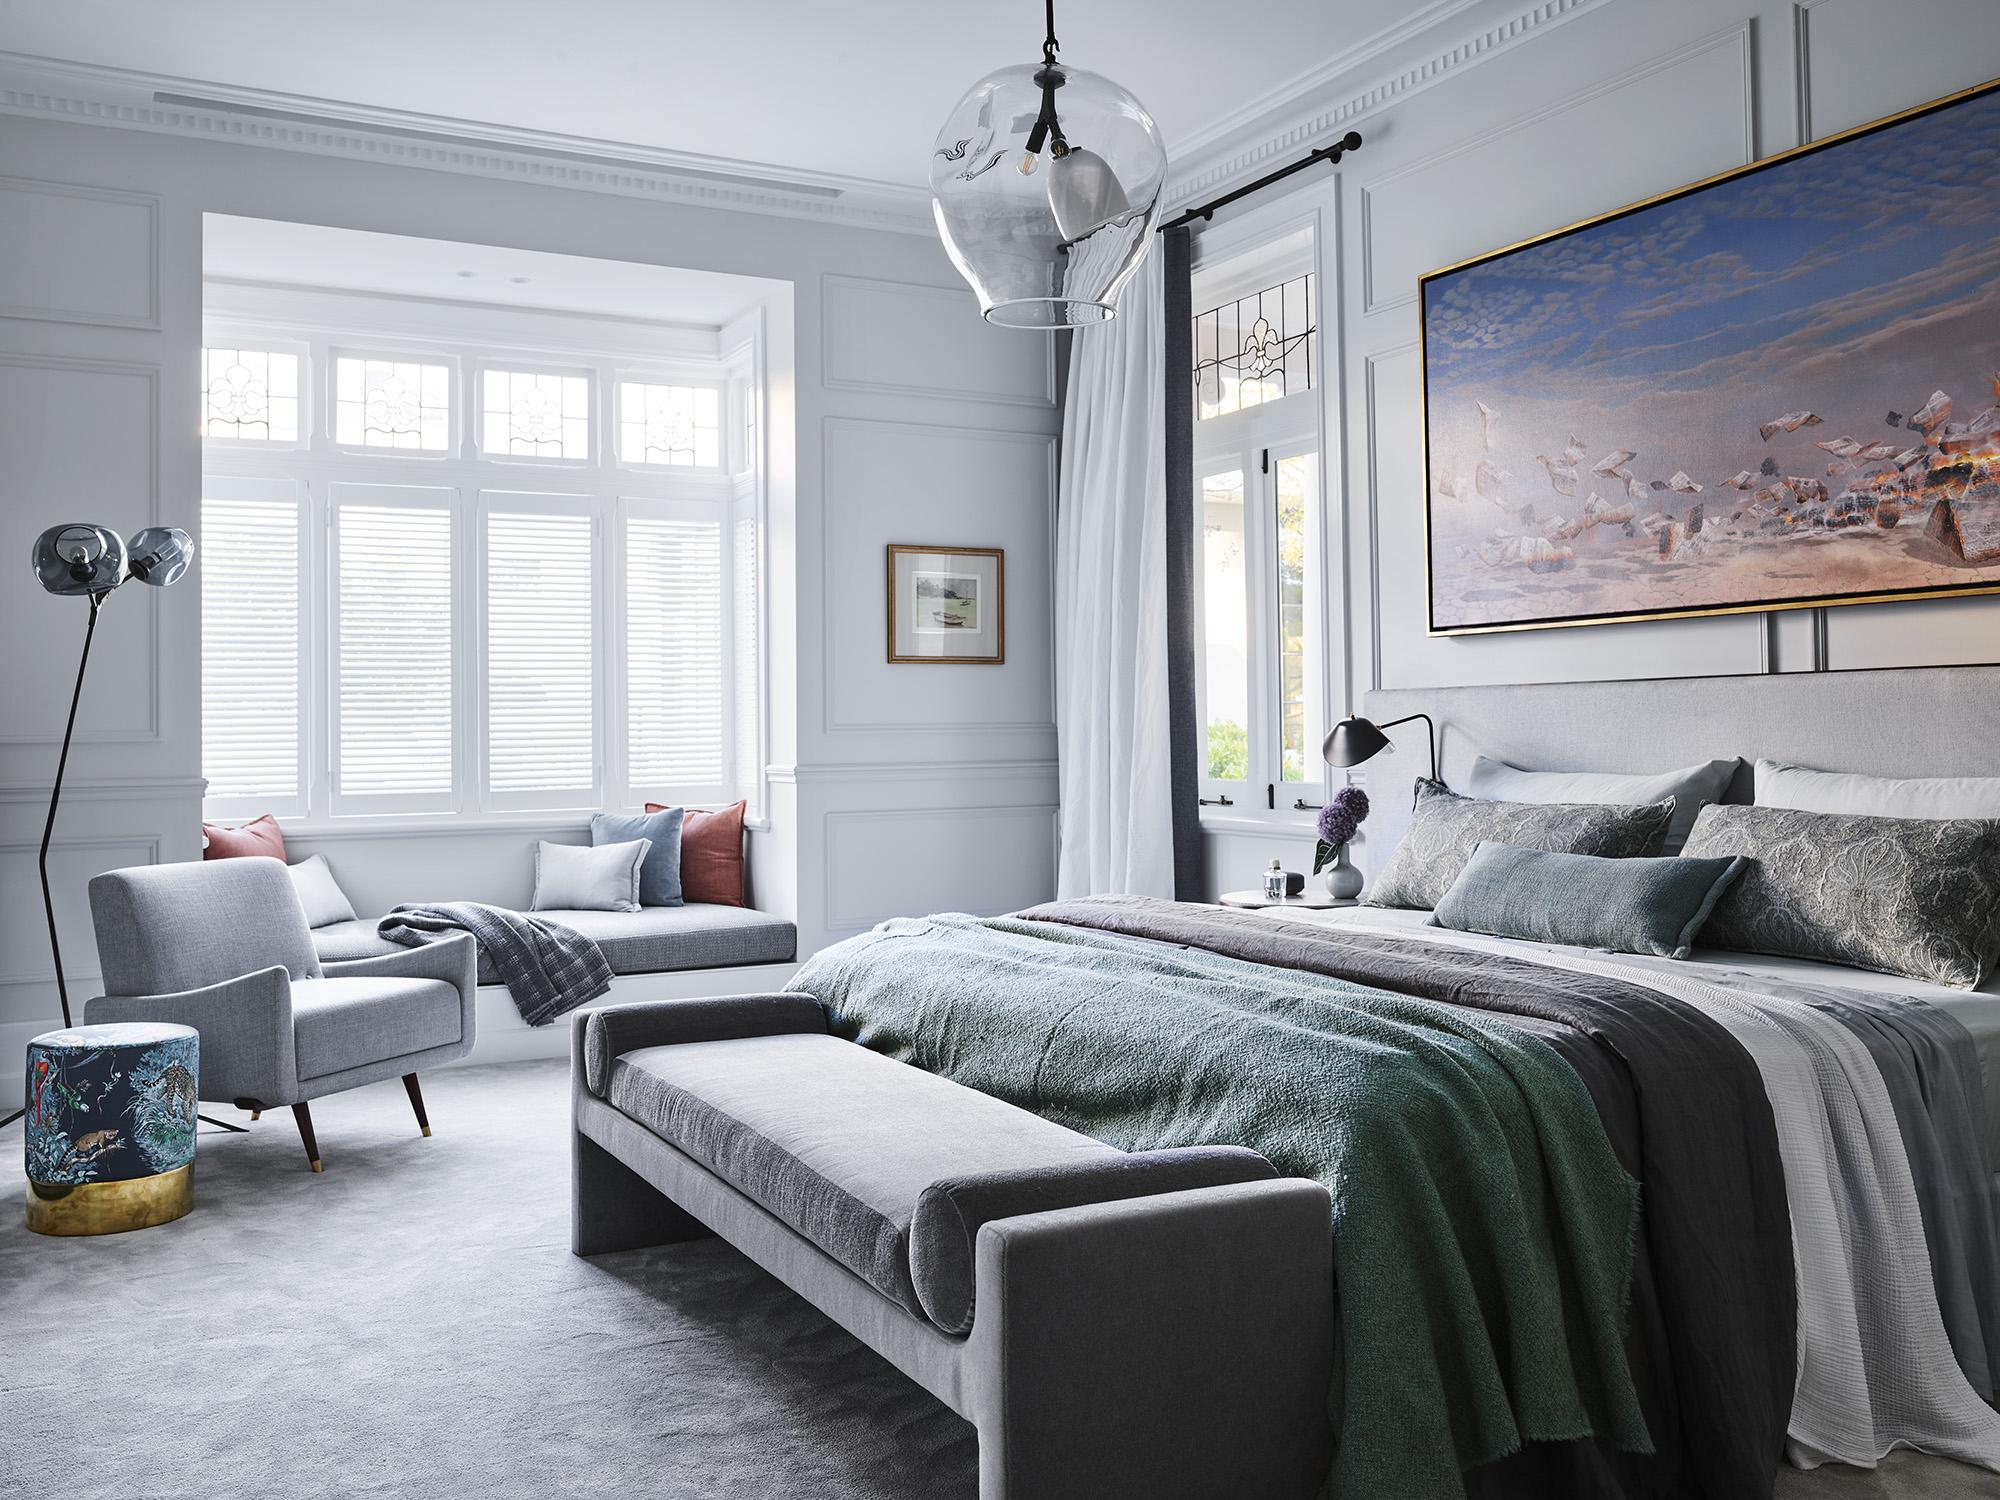 Bedroom designed by Alexandra Donohoe Church